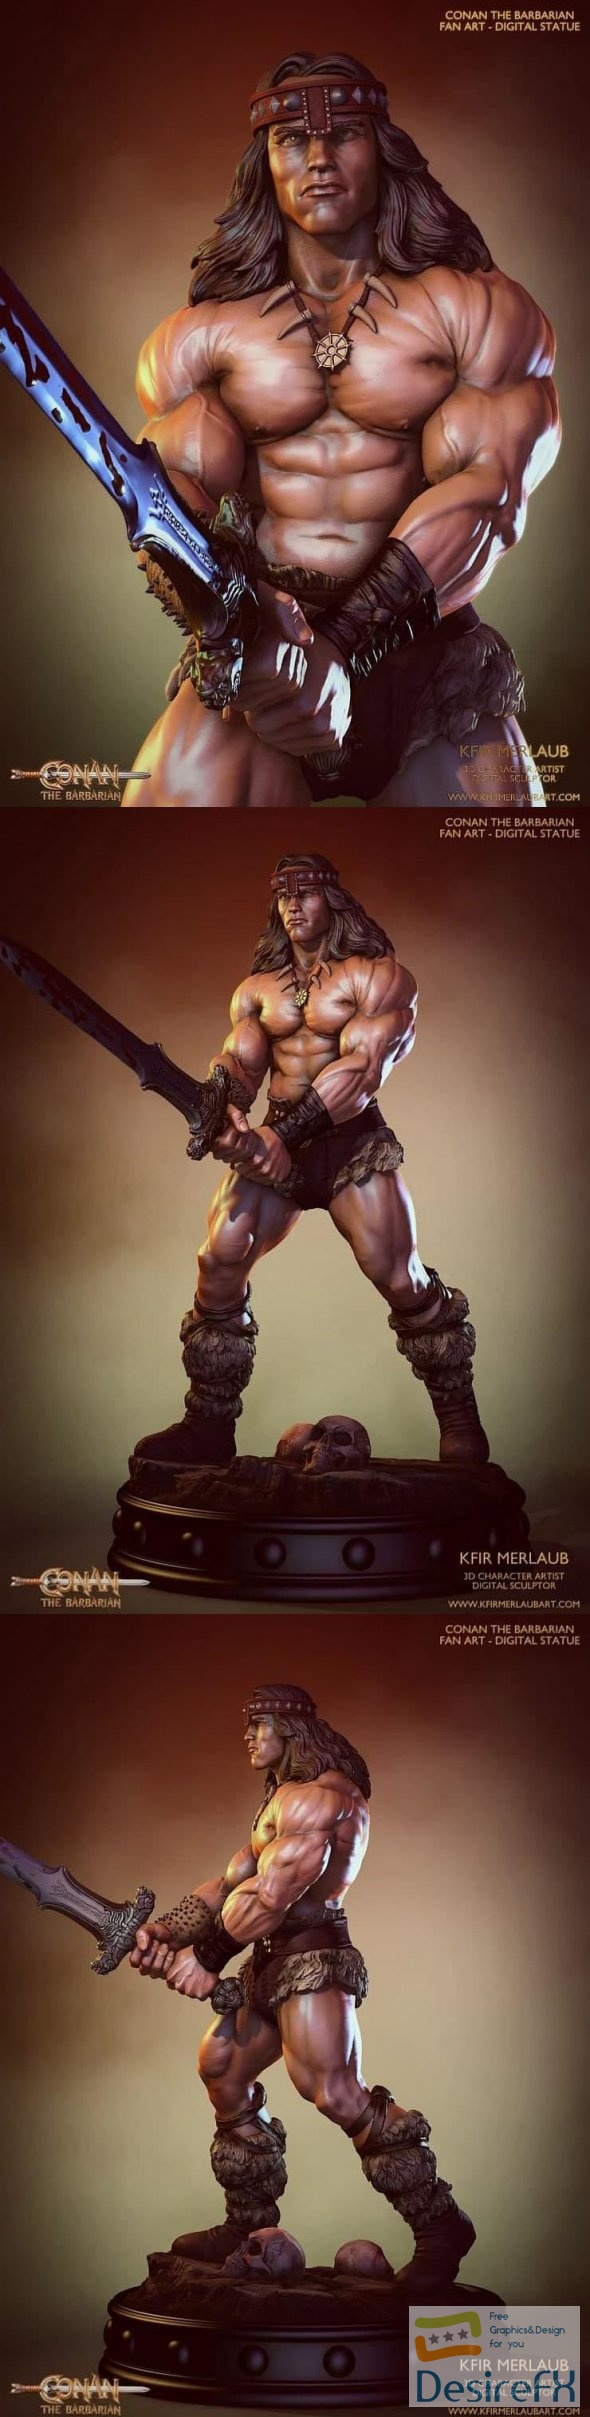 Conan the Barbarian Statue 3D Print